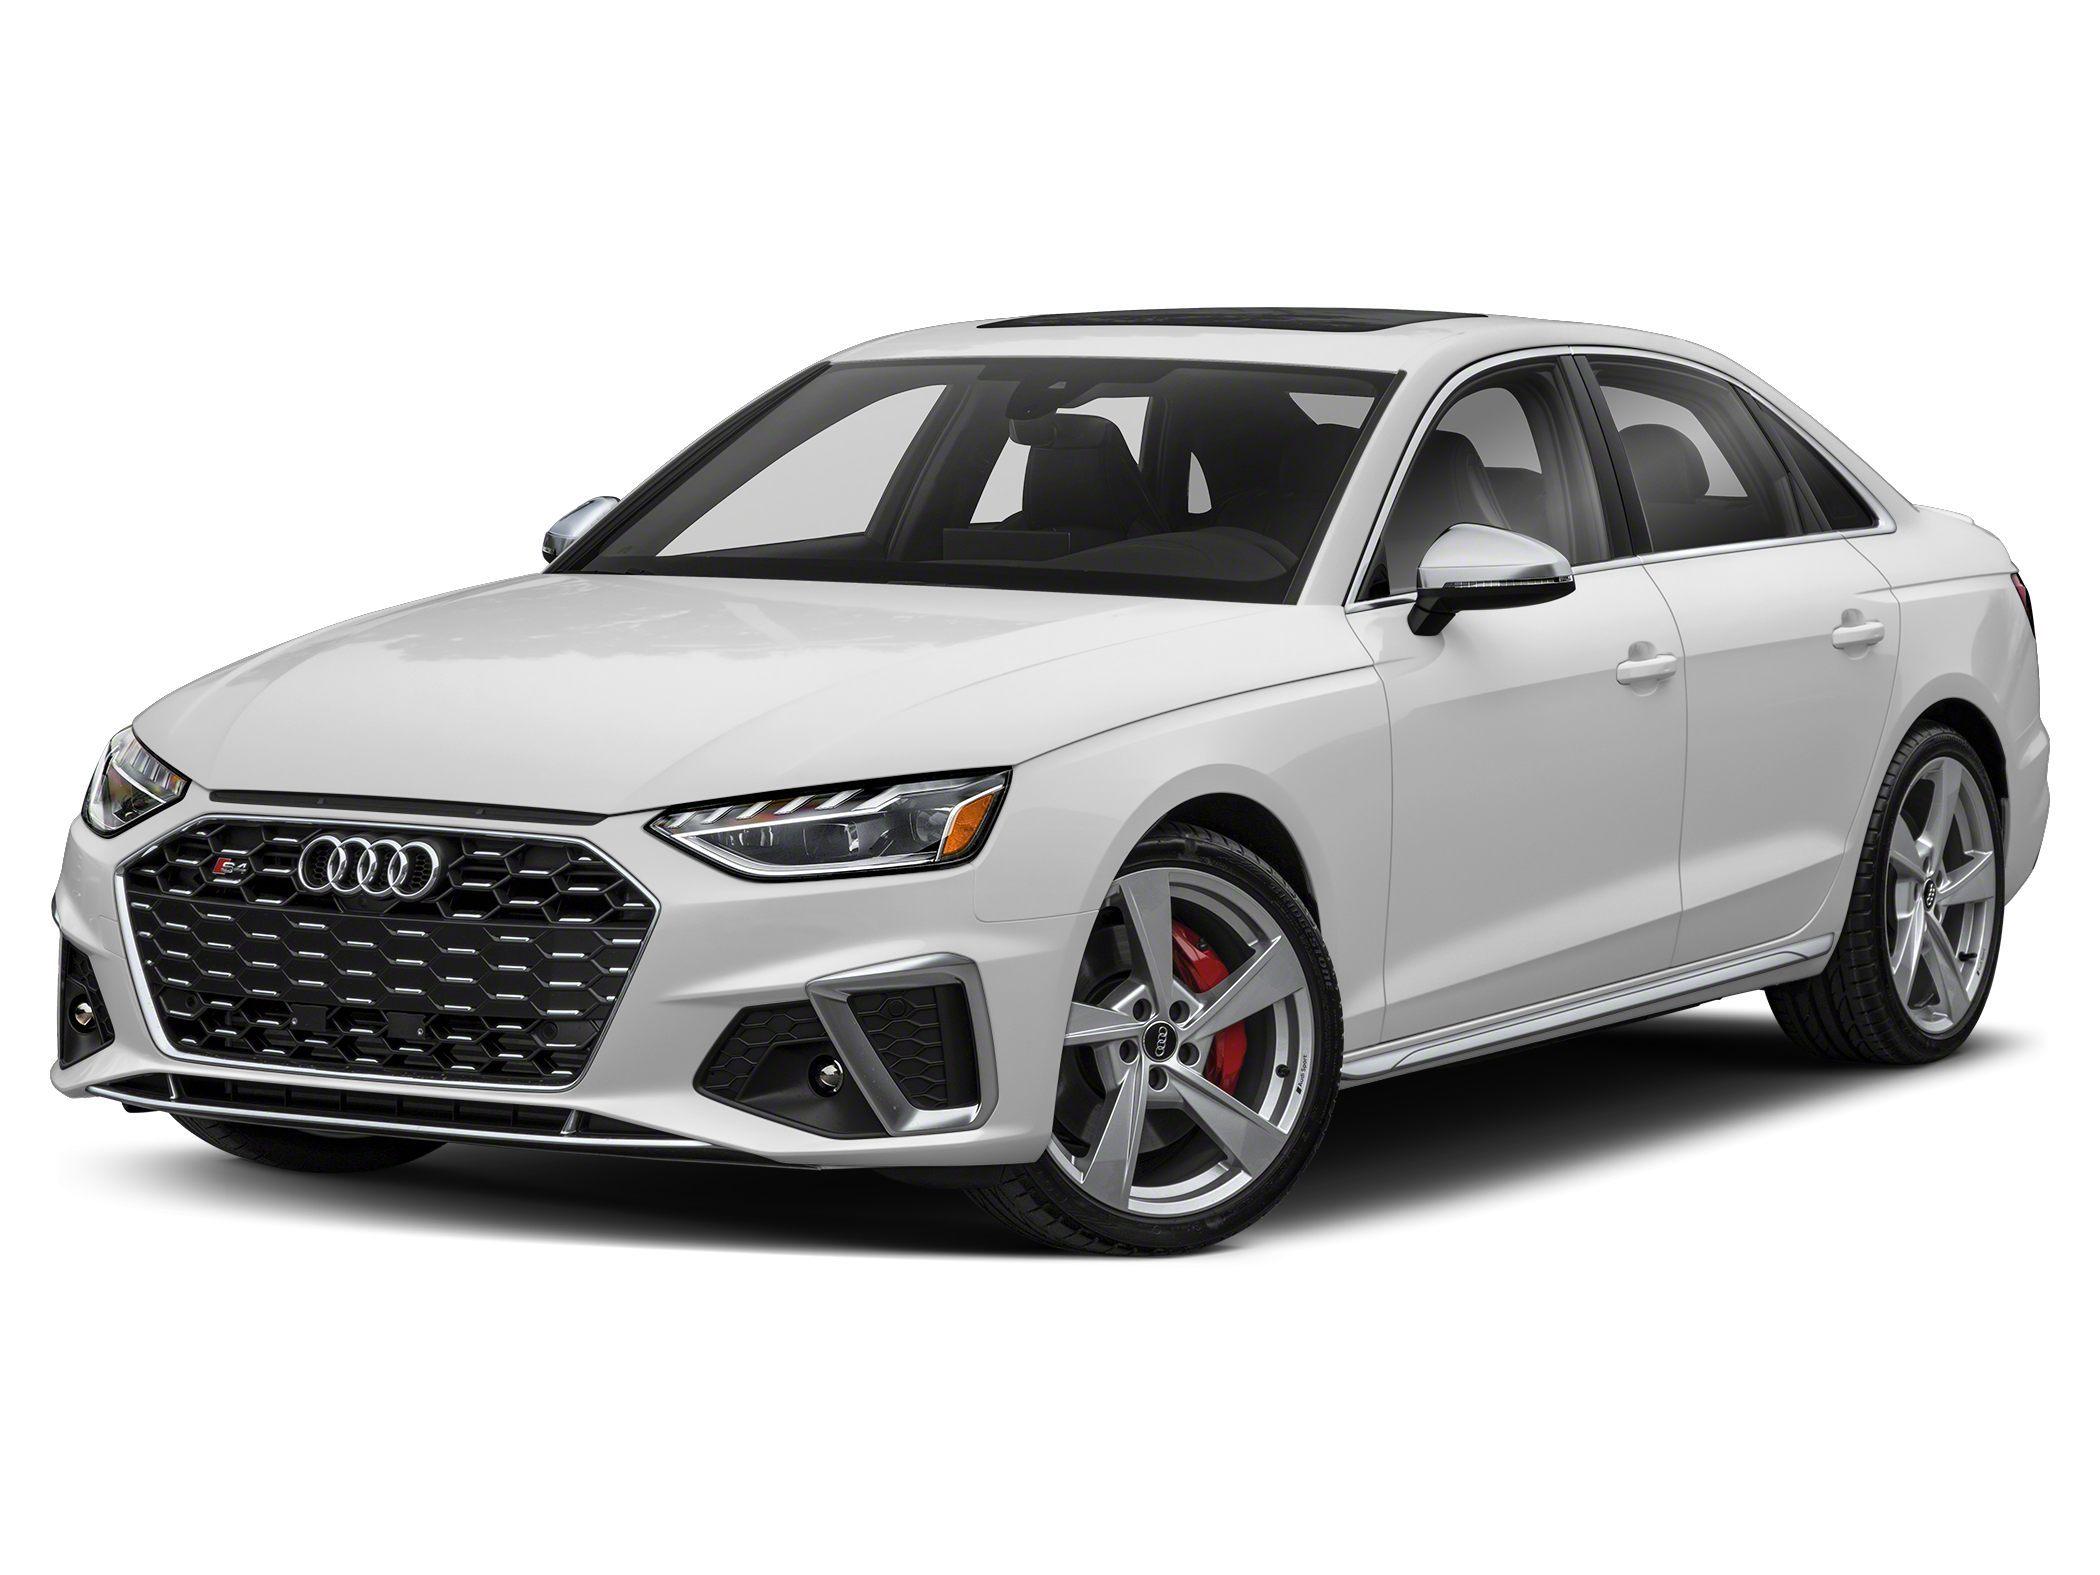 2021 Audi S4 Sedan